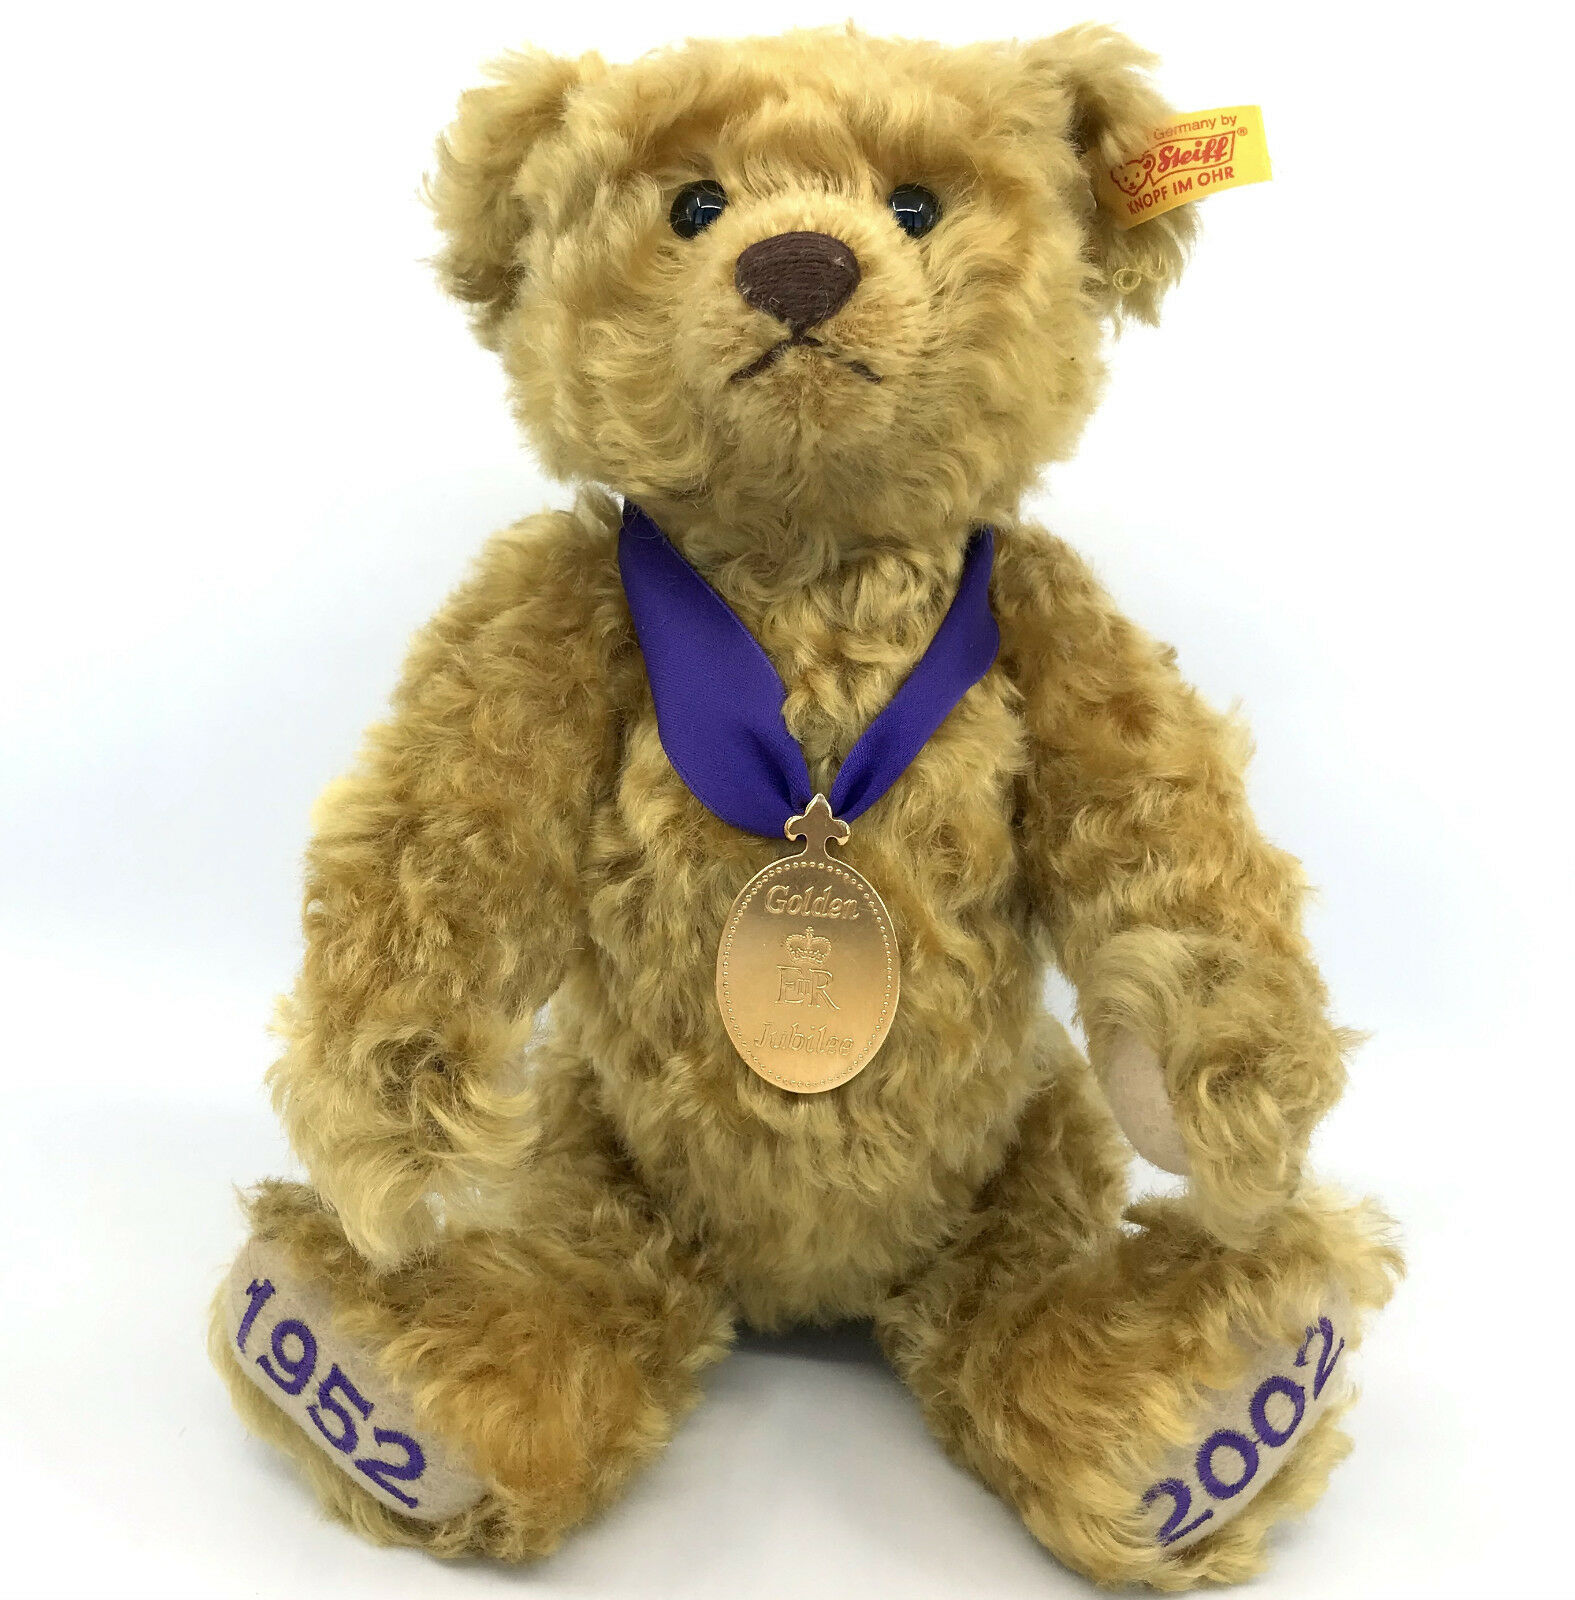 Steiff DM Queen oroen Jubilee Teddy Bear Mohair Plush Medallion ID Button 2002